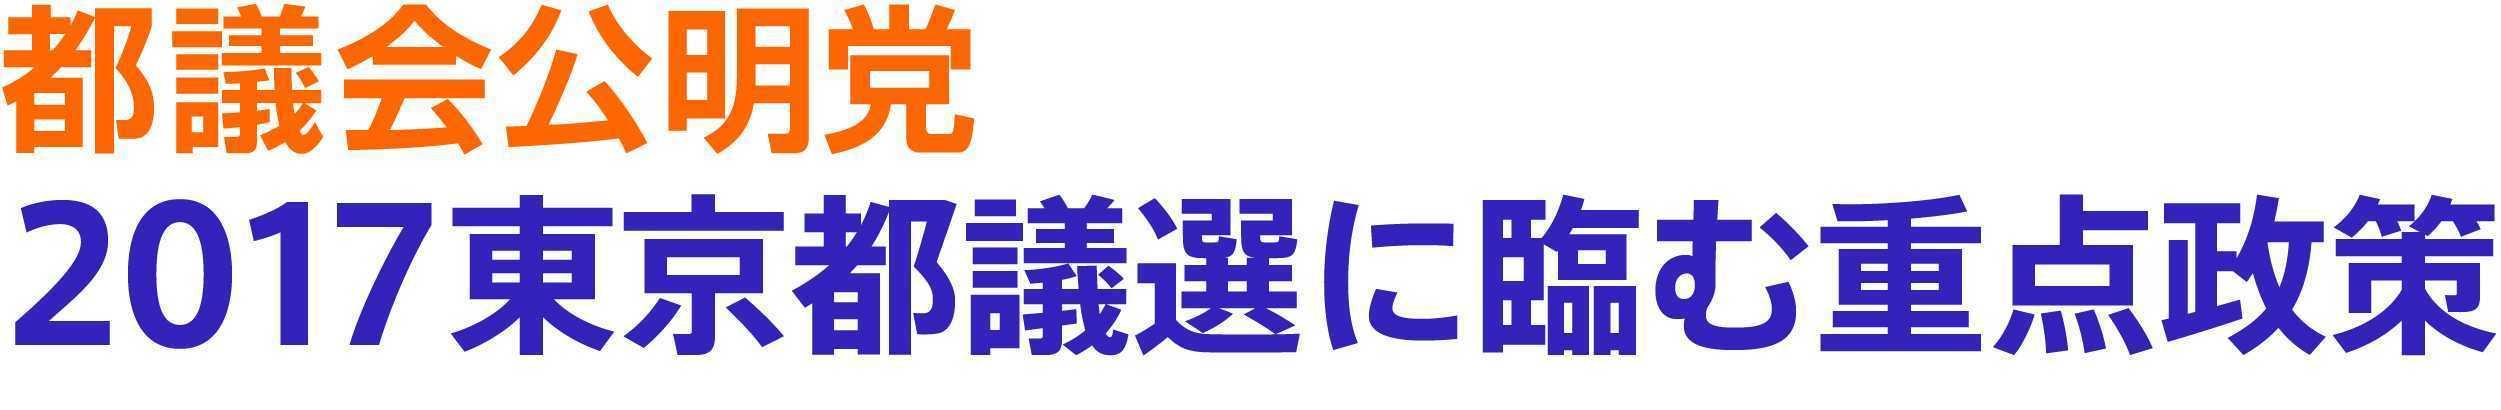 都議会公明党 2017東京都議選に臨む重点政策